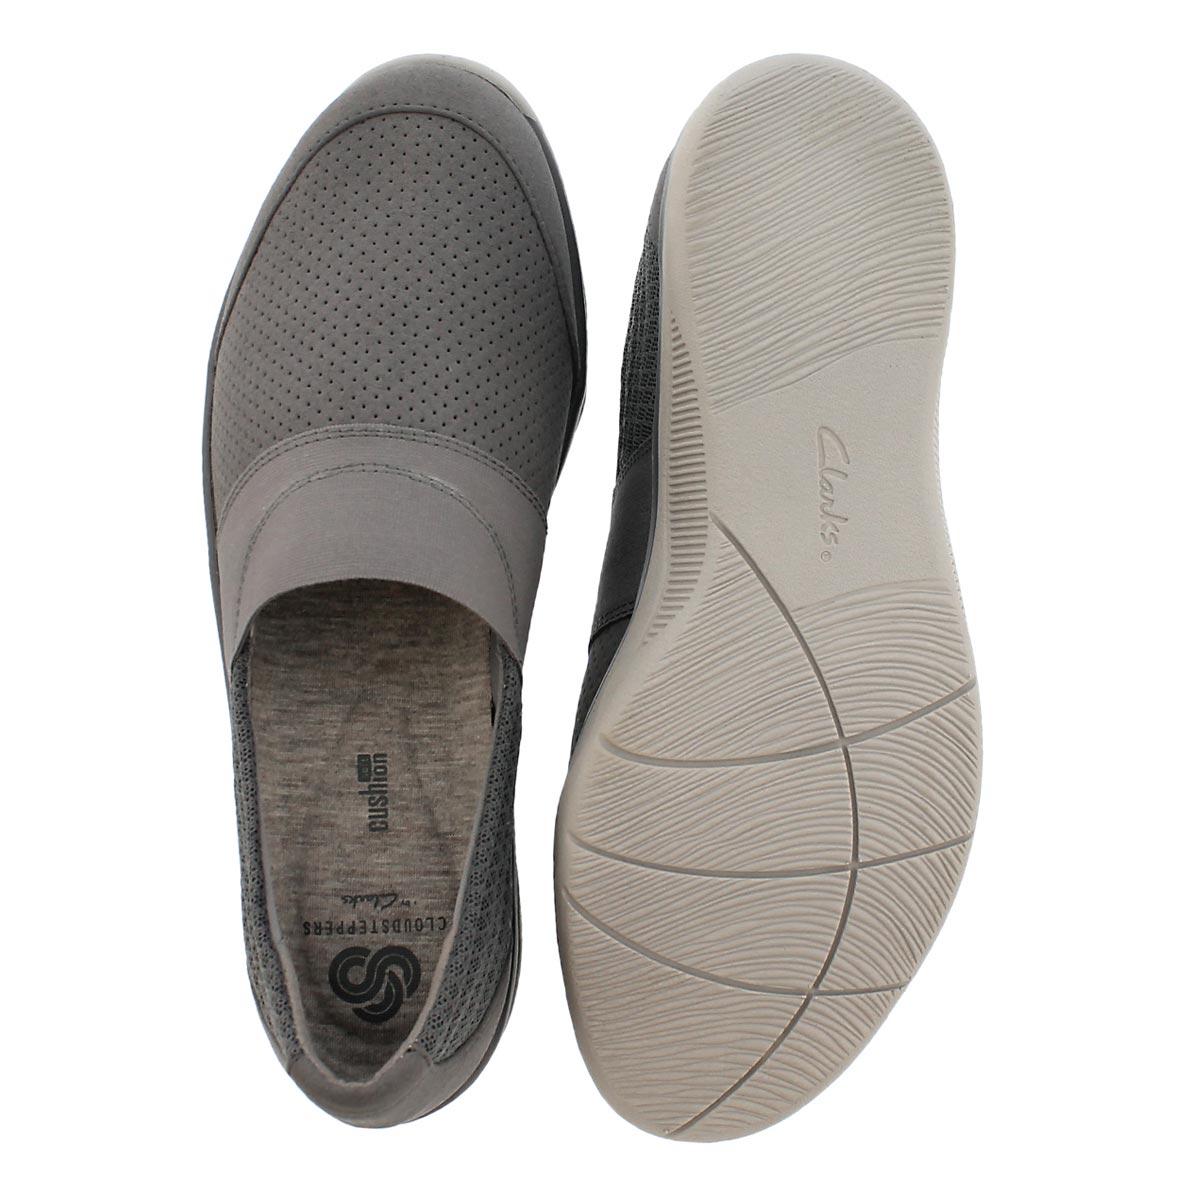 Lds Mckella Mesa grey casual slip on